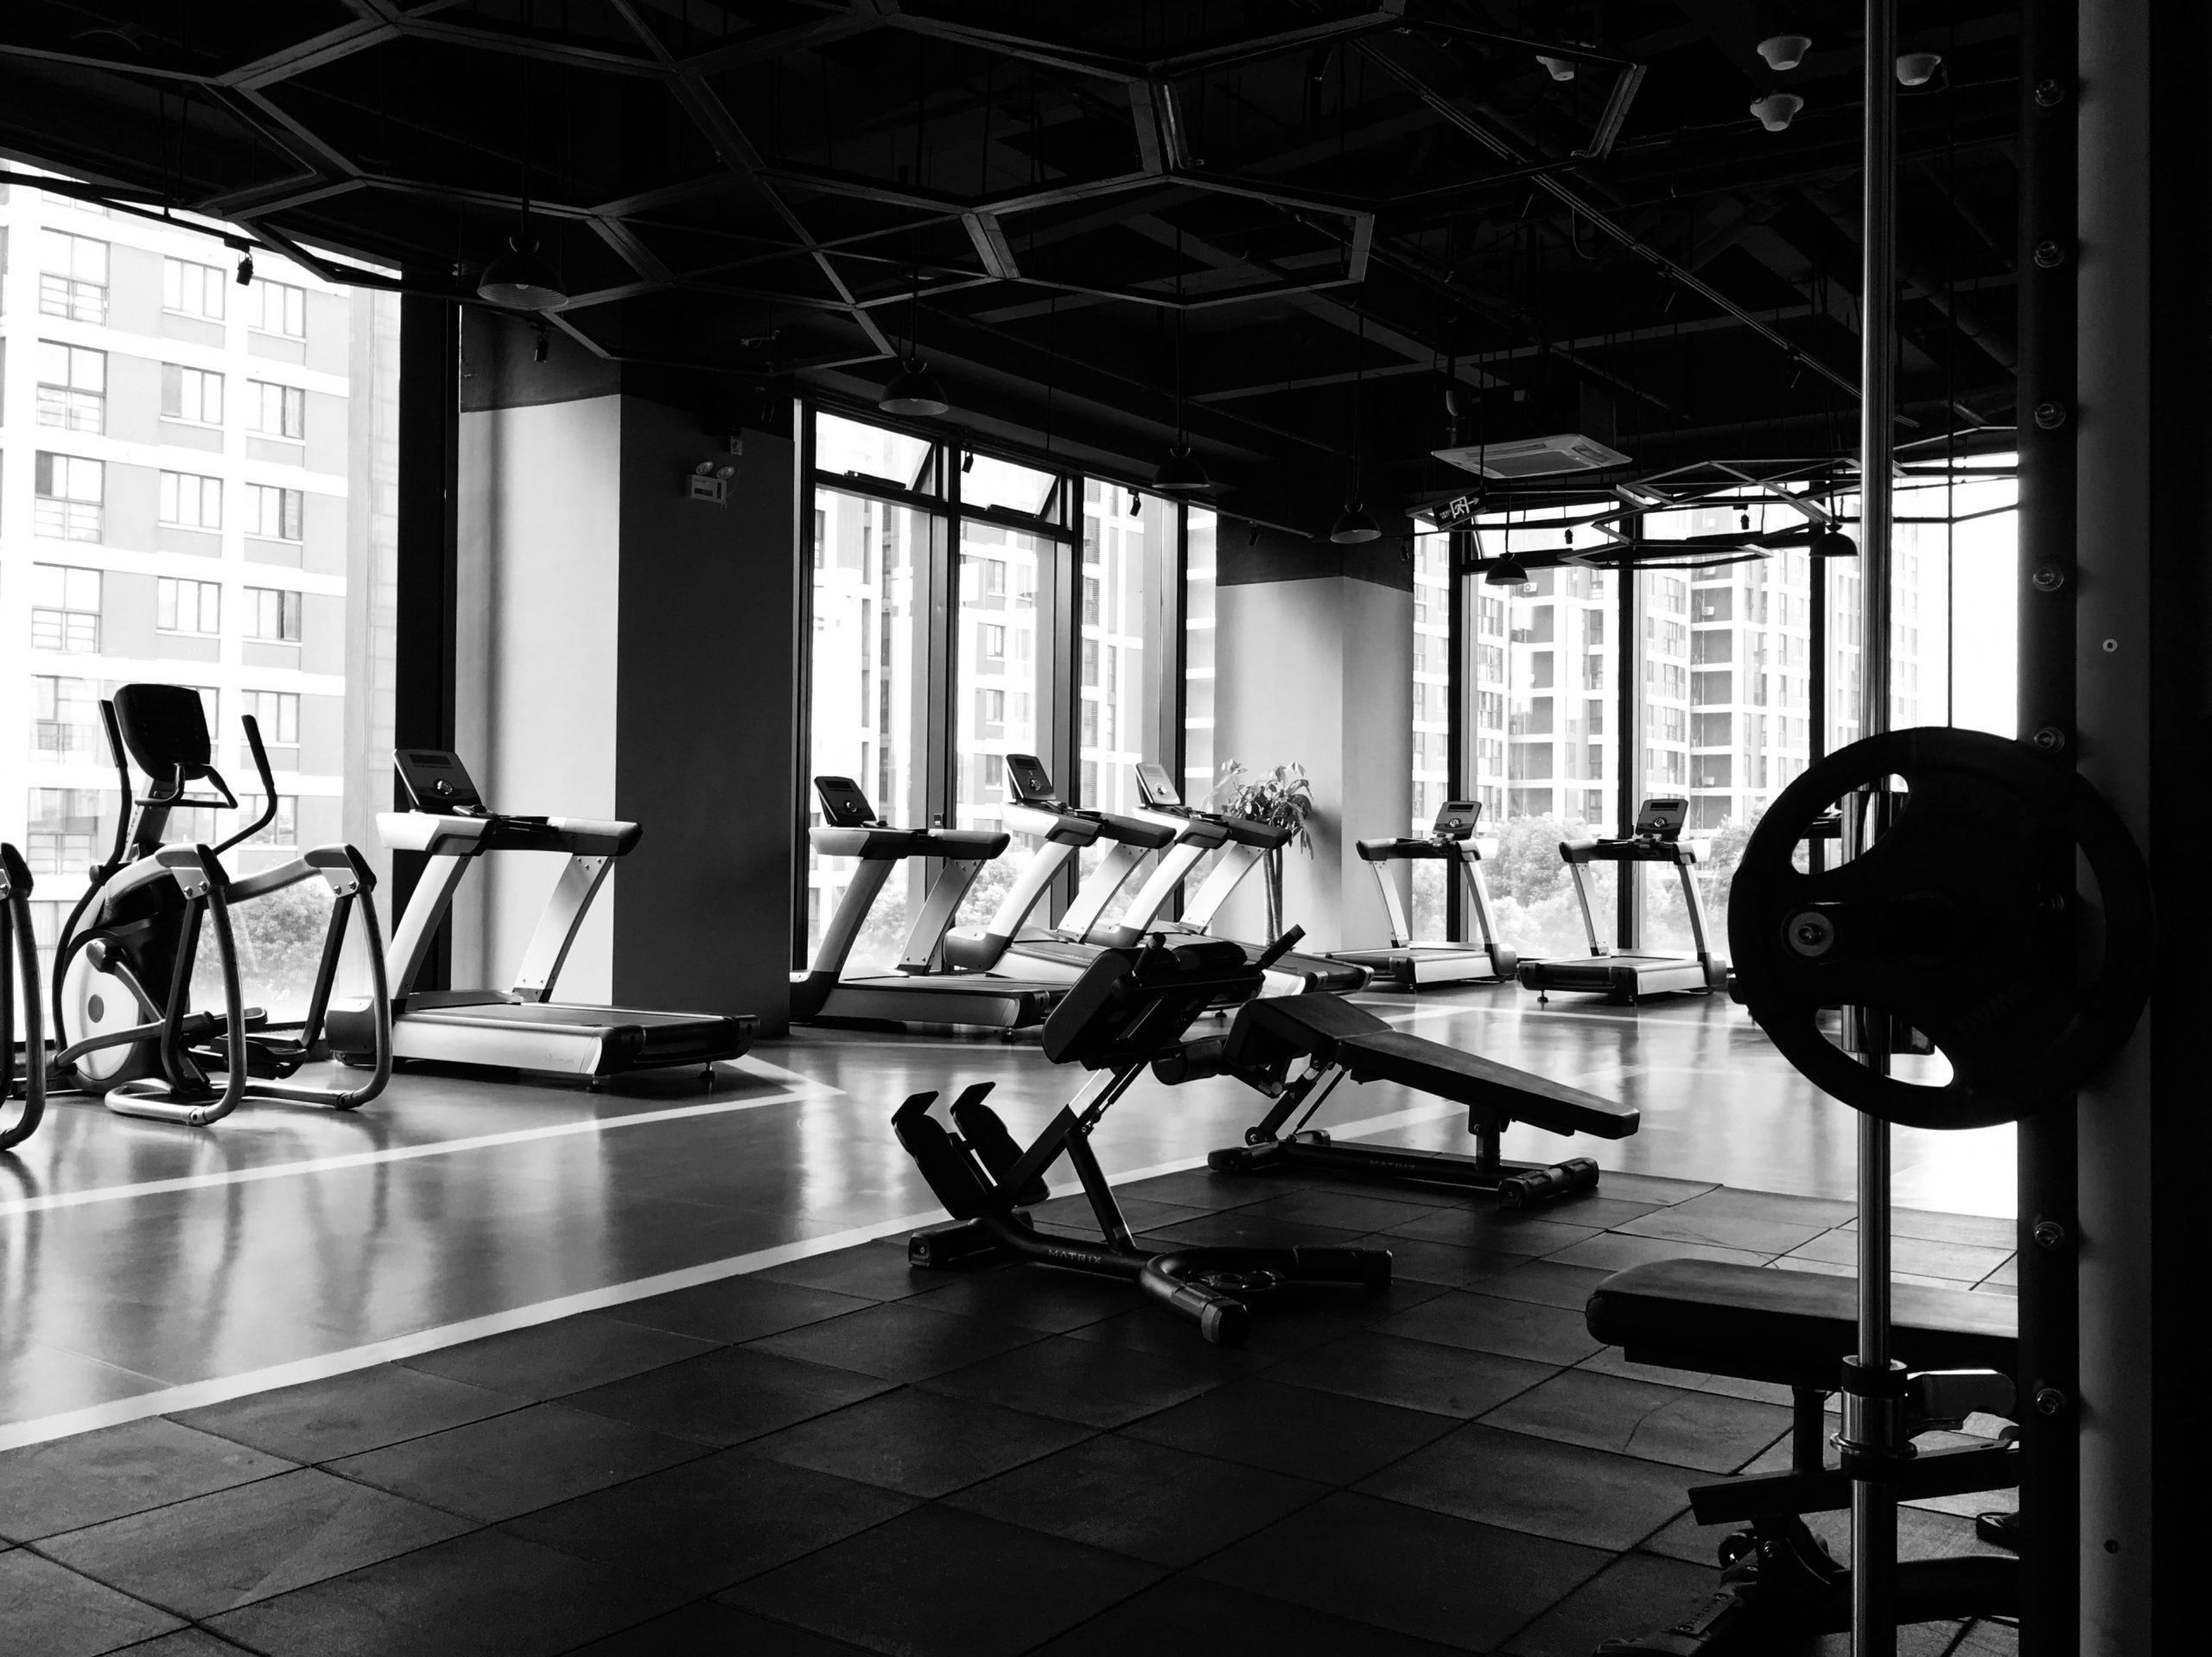 Salle de sport avec machines de musculation